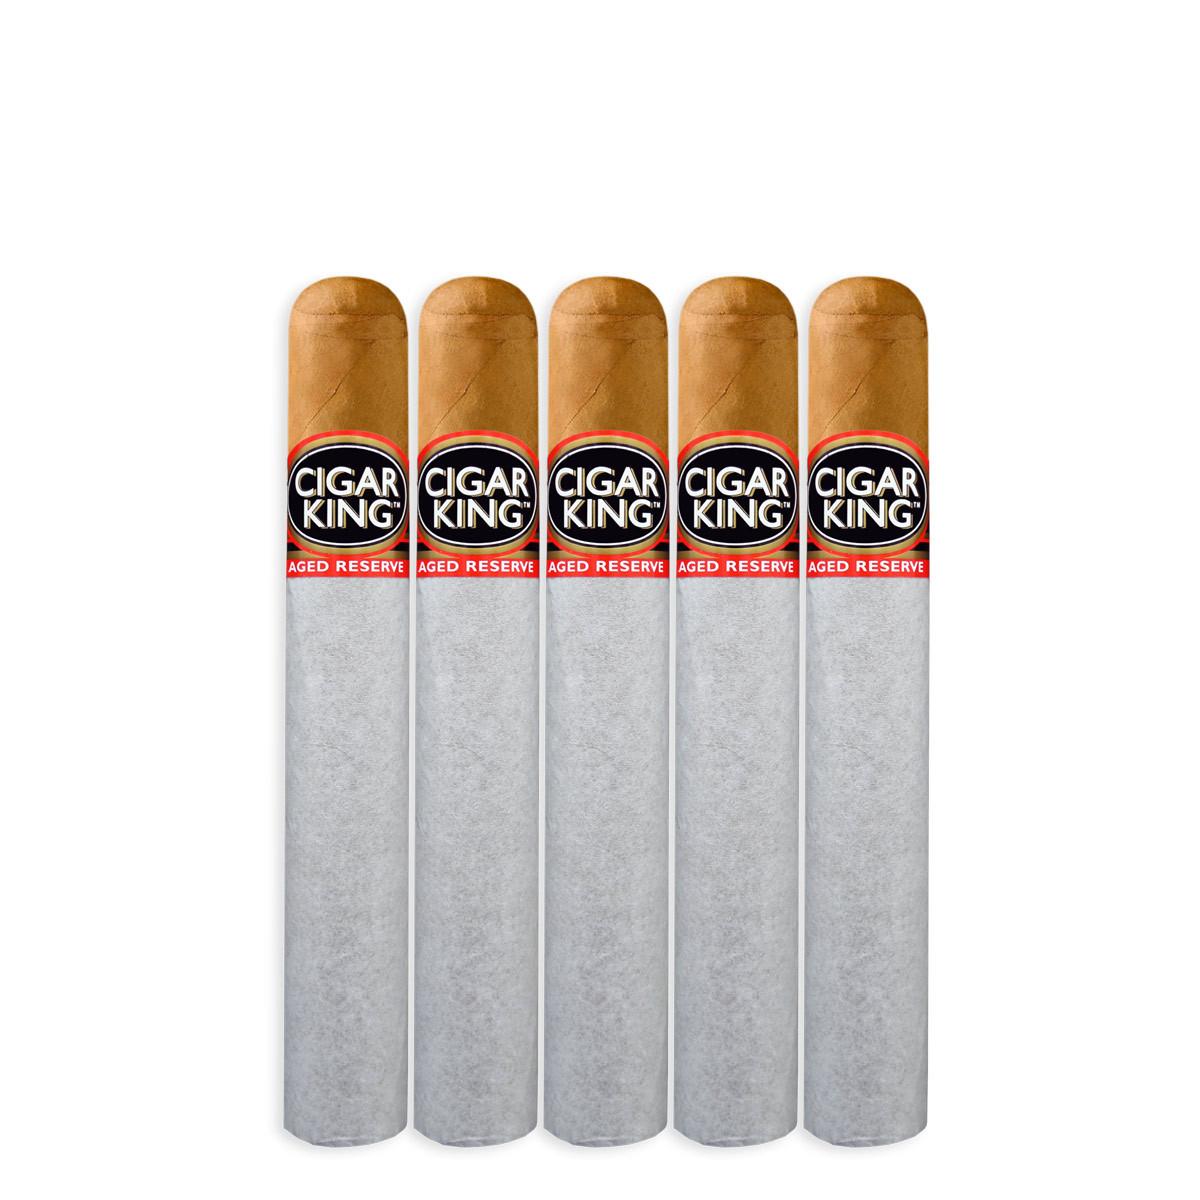 Cigar King Aged Reserve Natural Robusto (5x50 / 5 Pack)